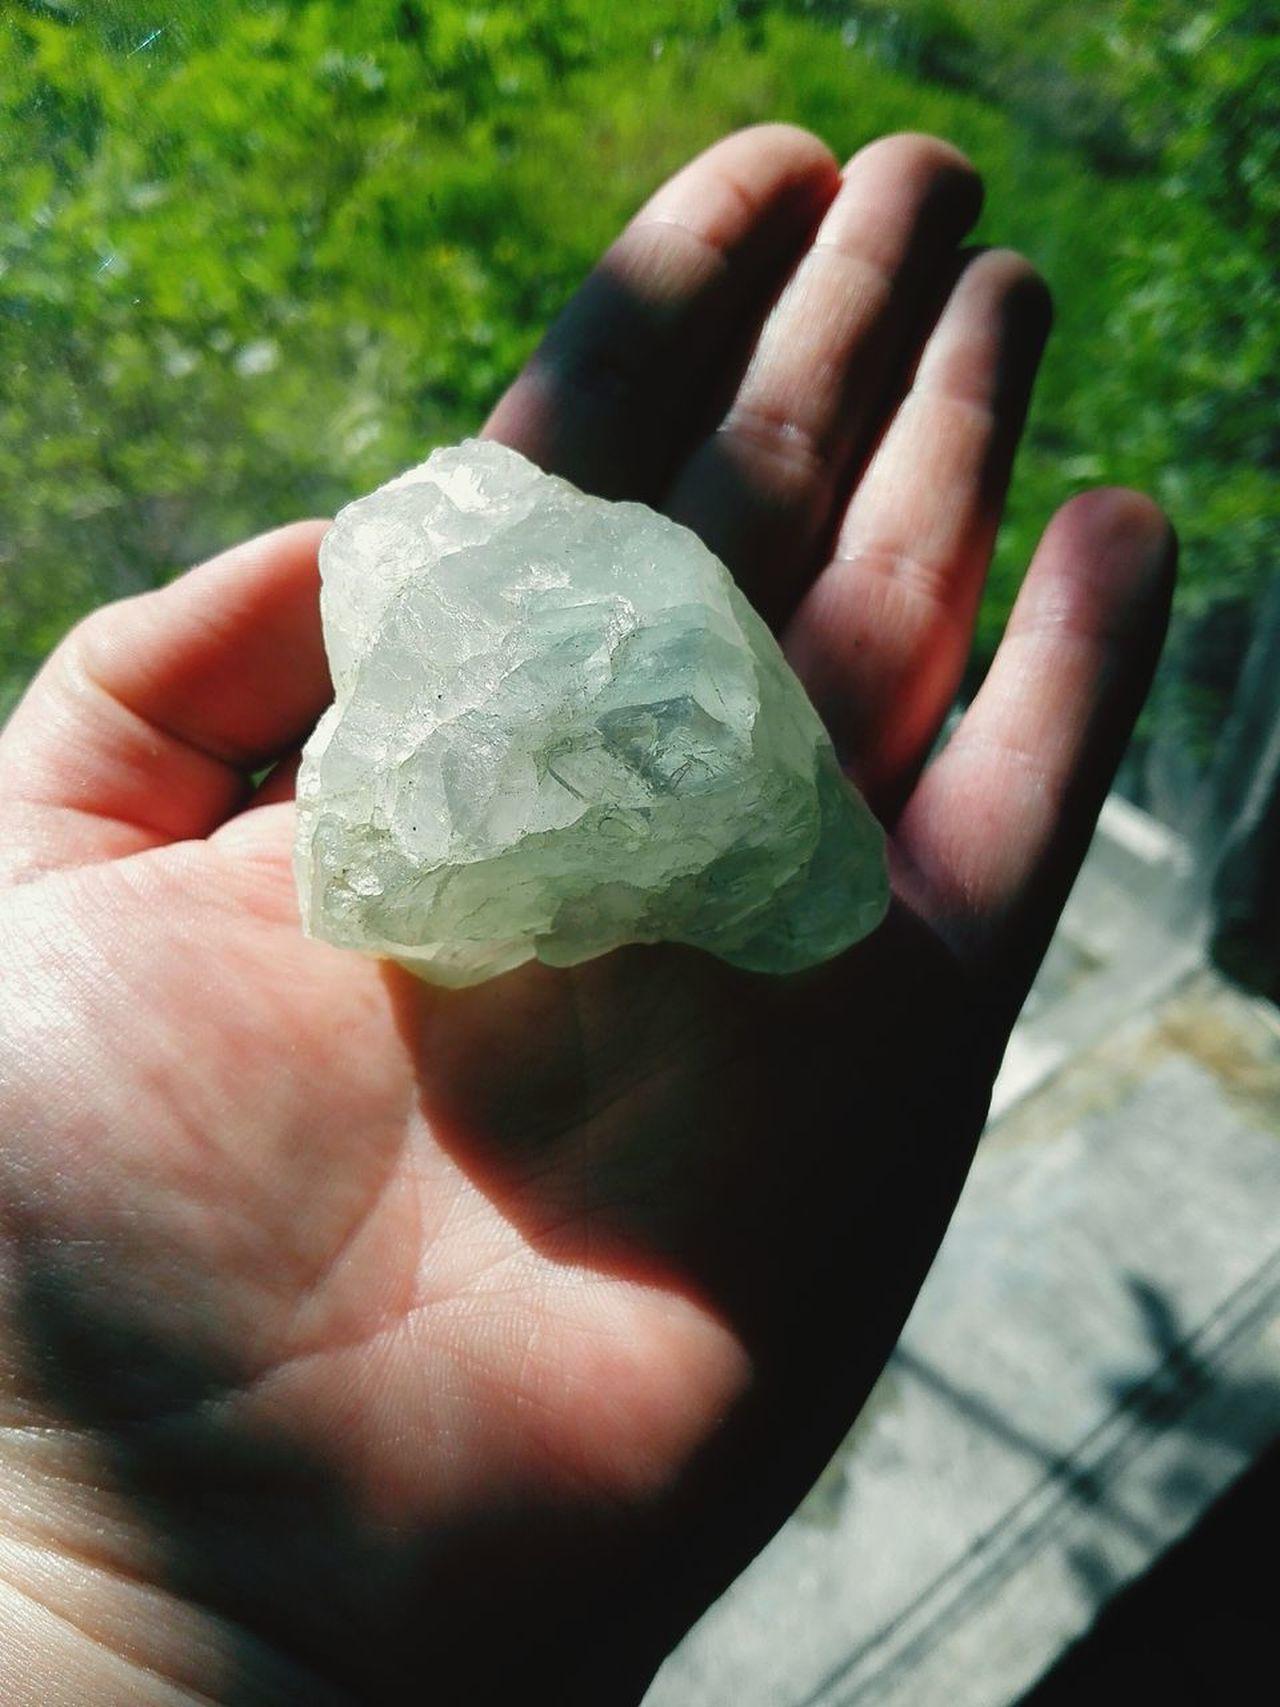 Crystal Stone Bluestone Sunshine Warm Day Hand Grass Green Nature Window